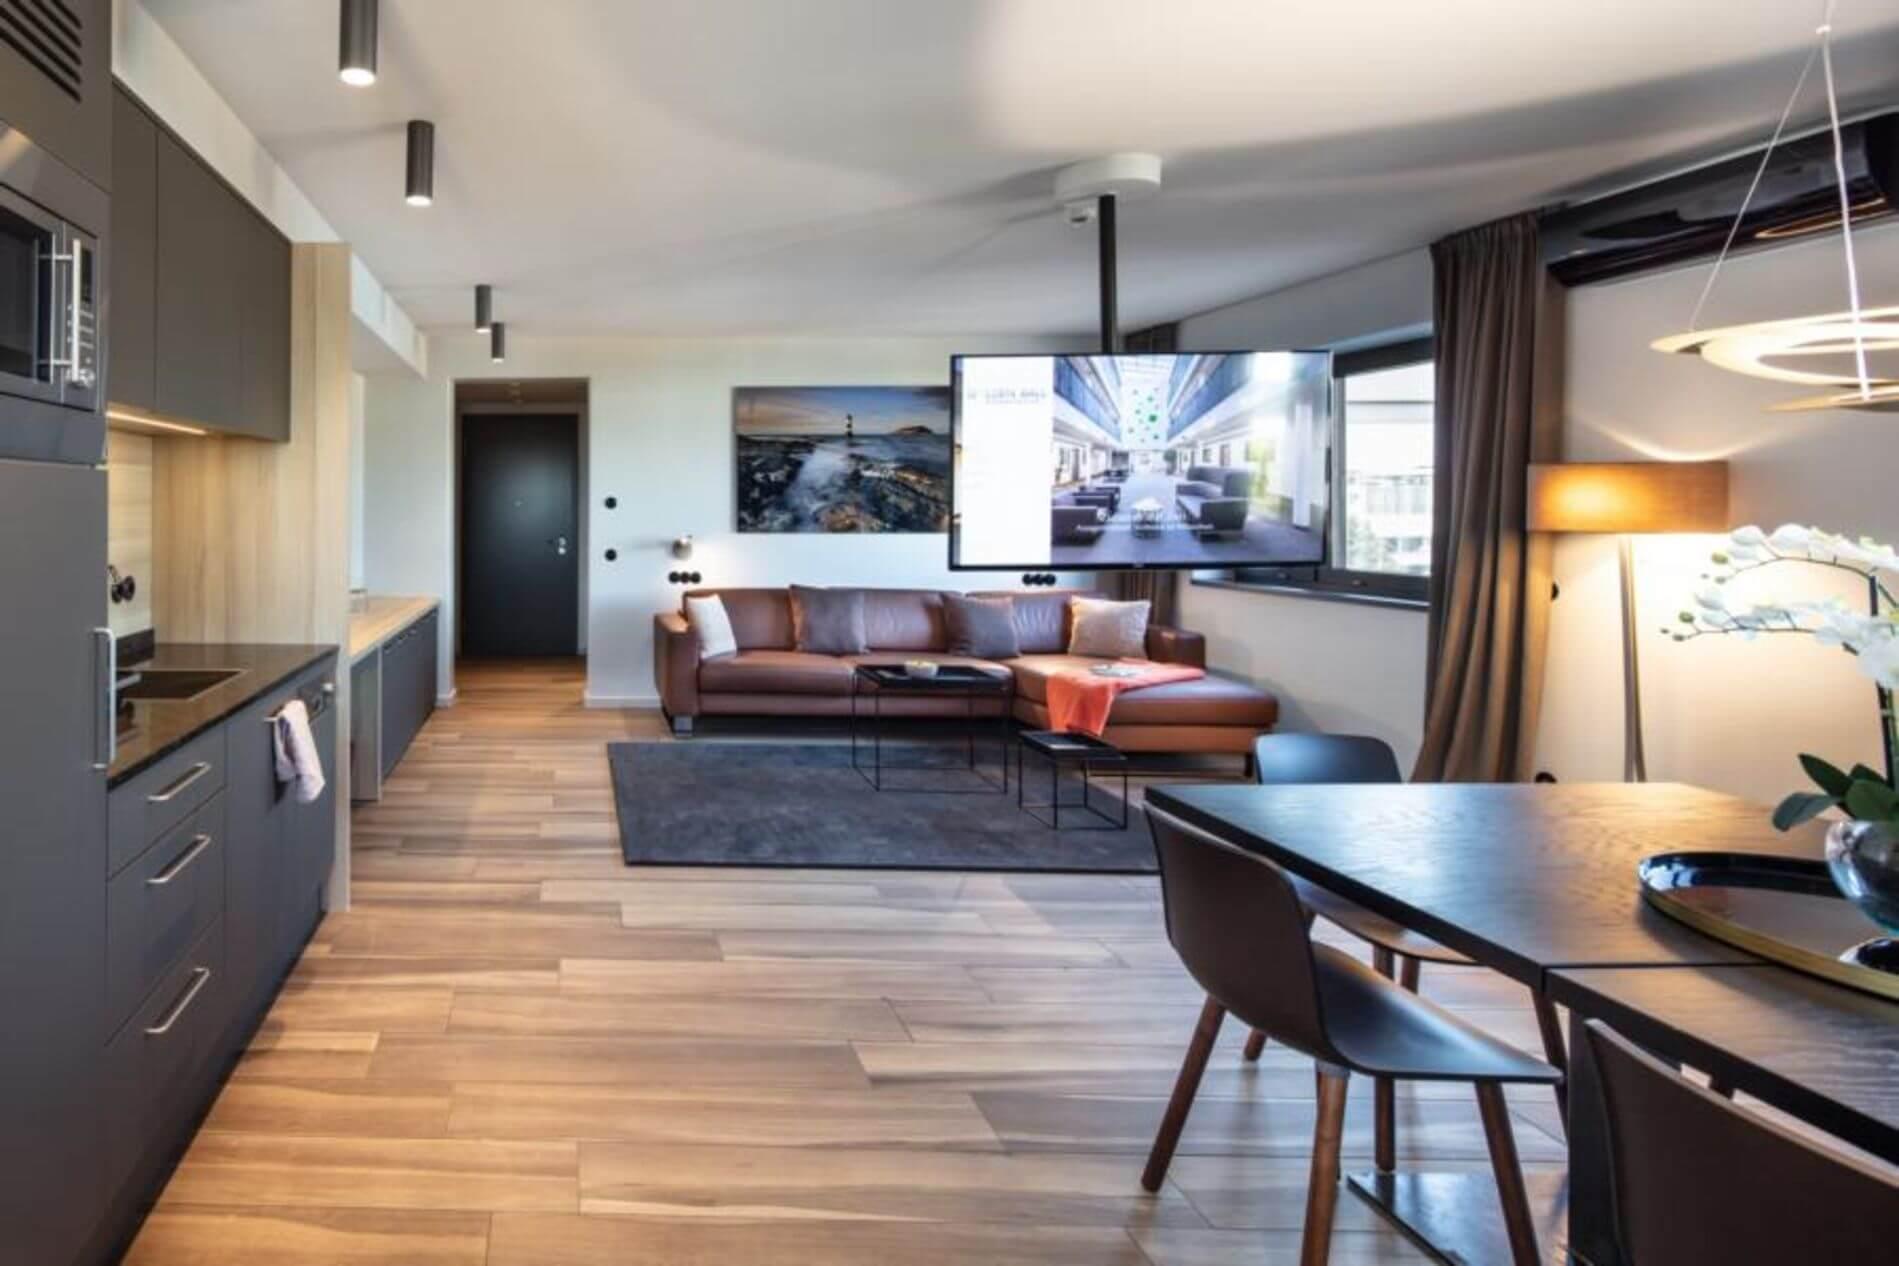 3 bedroom property for rent in Munich Dornach